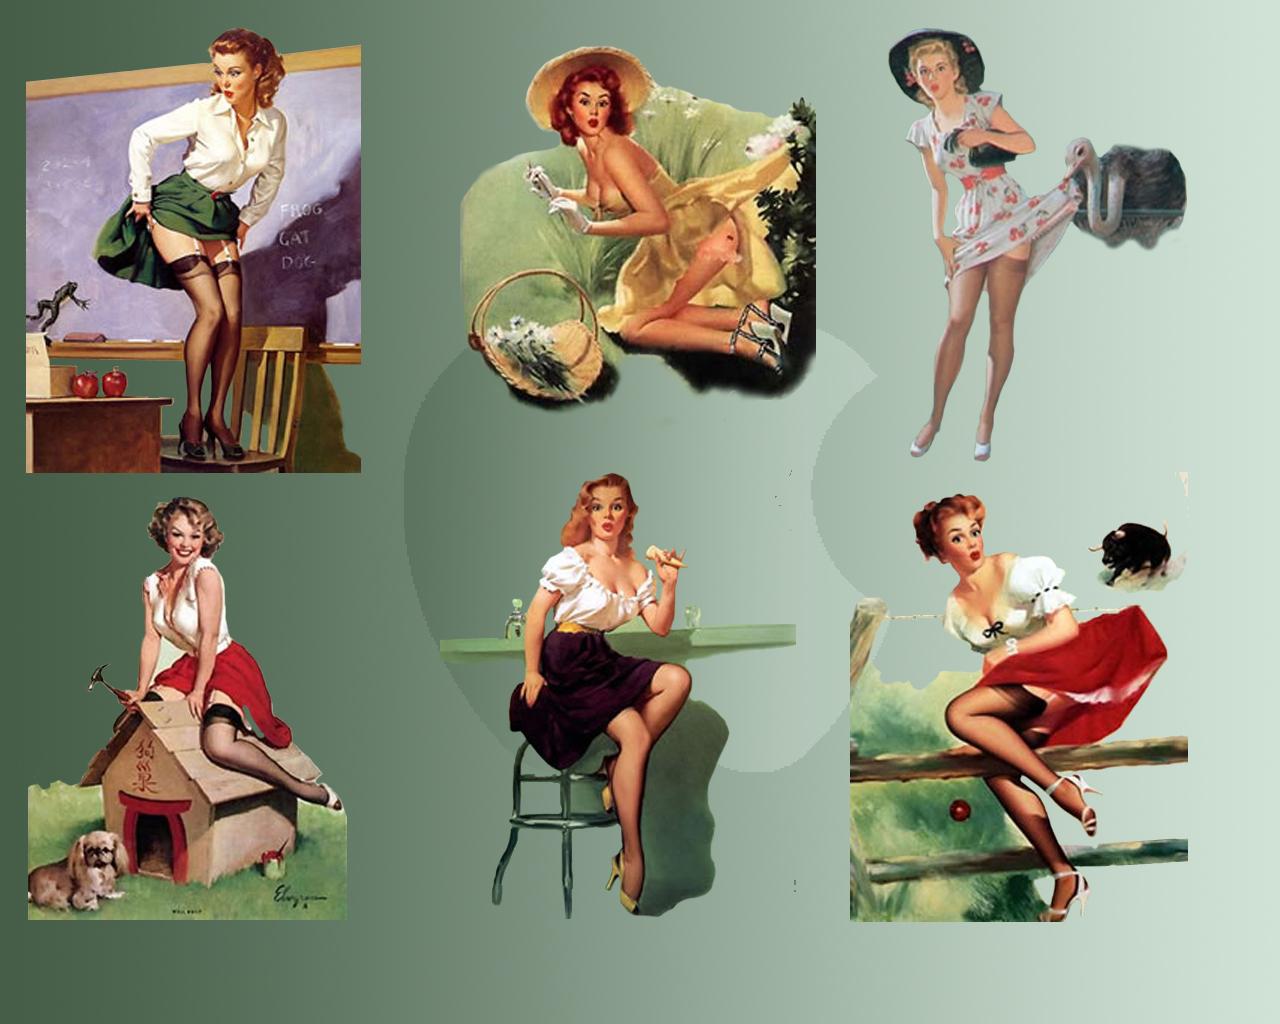 Pin up girls wallpapers im genes para compartir sagitarioxp - Pin up desktop backgrounds ...